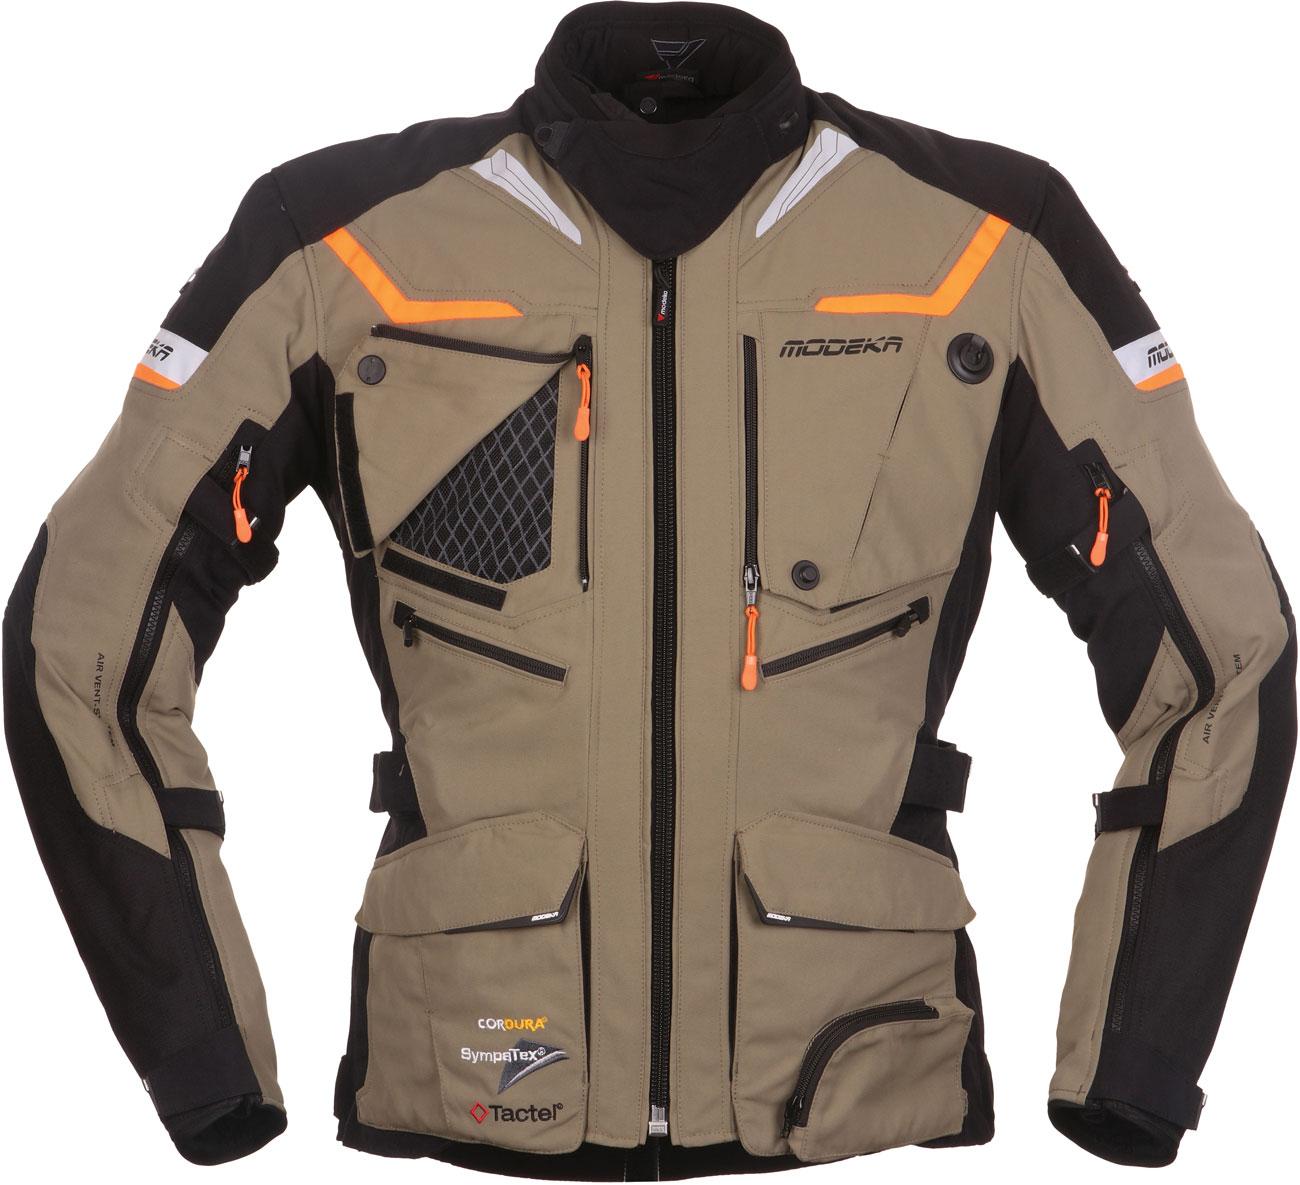 Modeka Panamericana, Textiljacke - Beige - XXL 084560-22-XXL